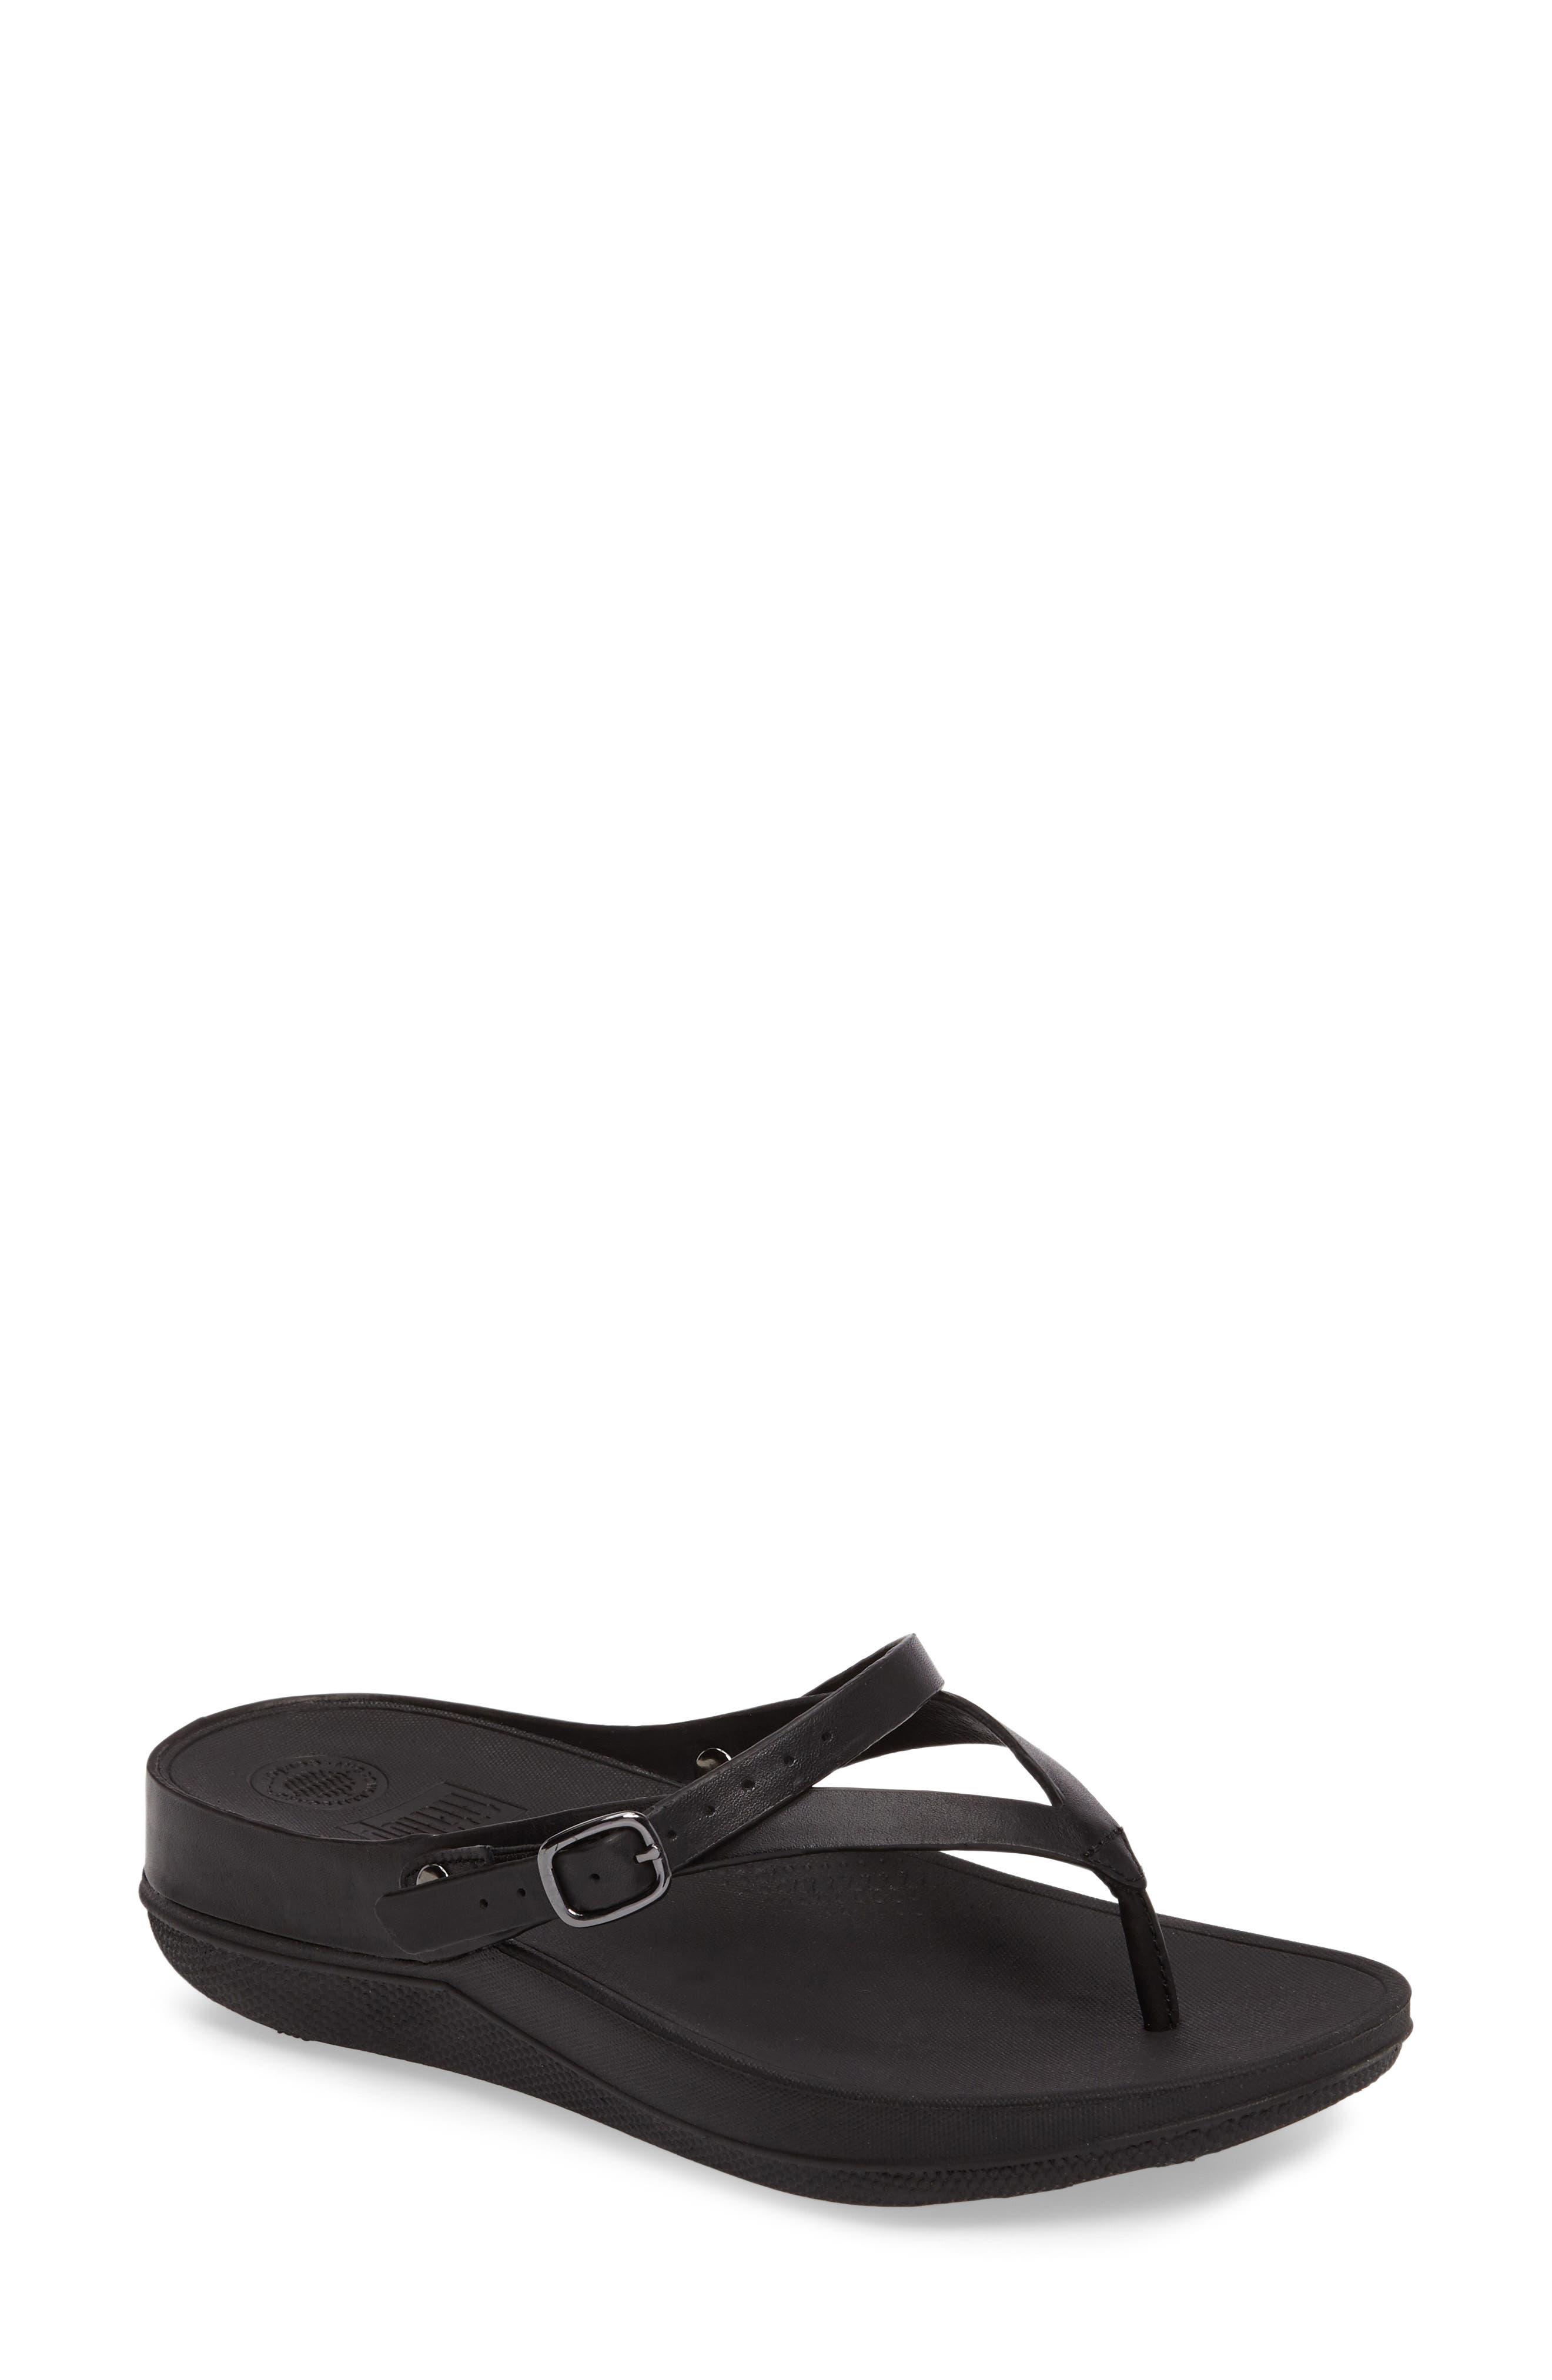 FITFLOP Flip Sandal